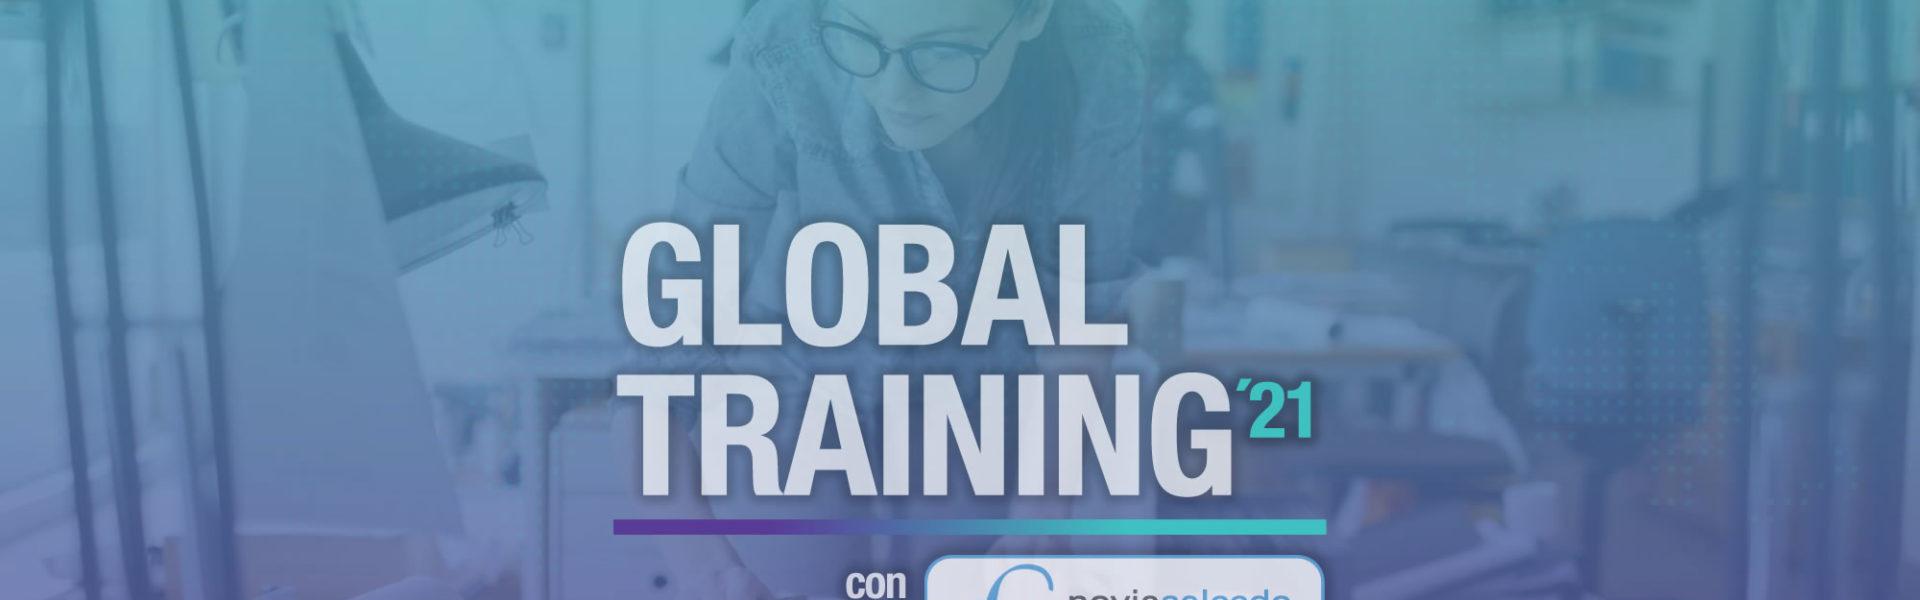 Becas Global Training 2021